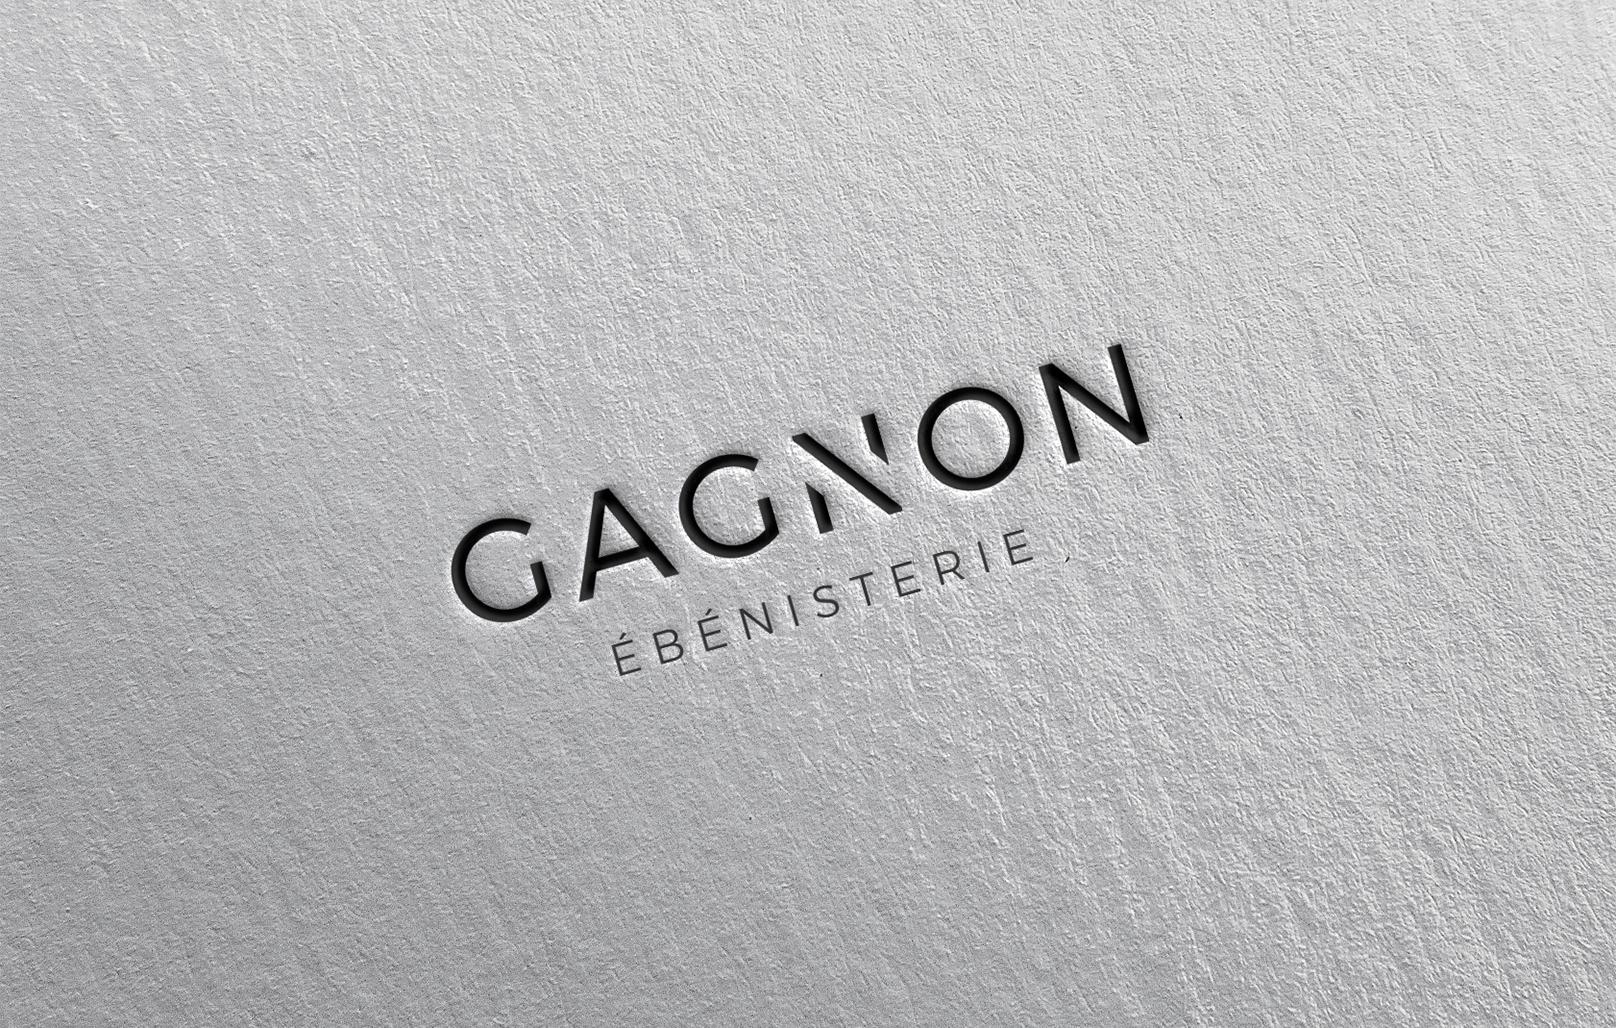 ebenisterie-gagnon-logo